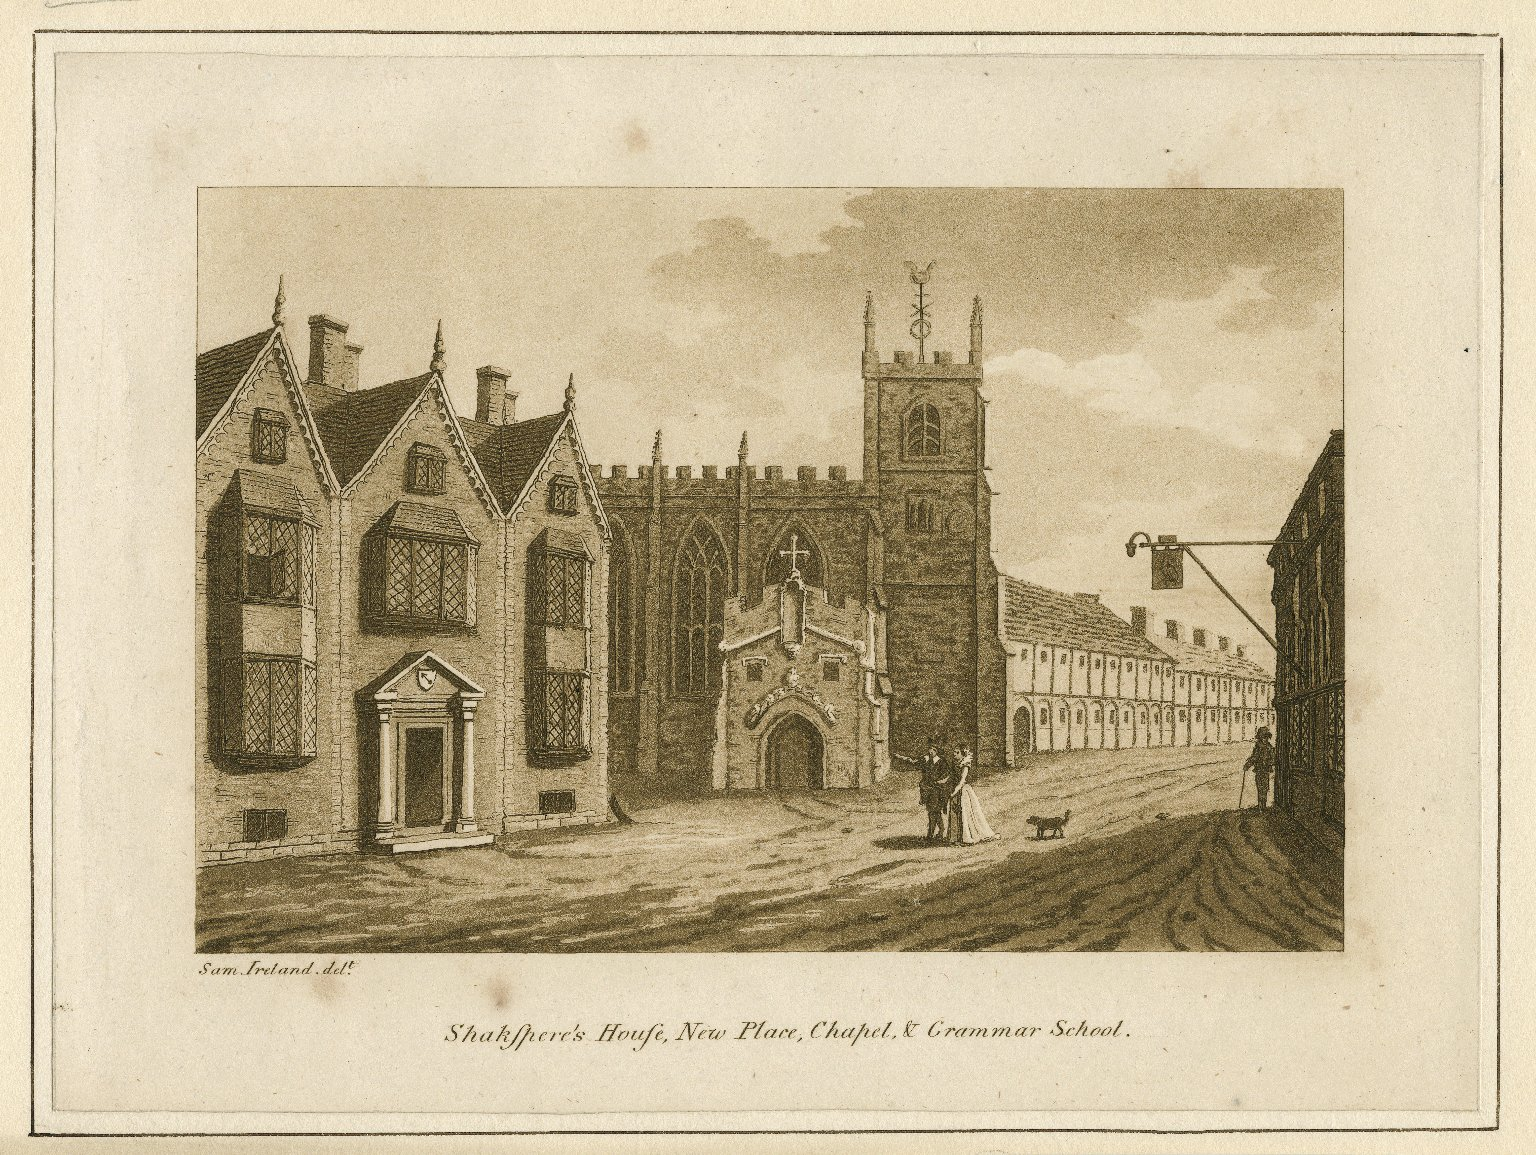 Shakspere's house, New Place, chapel, & grammar school [graphic] / Sam. Ireland delt.